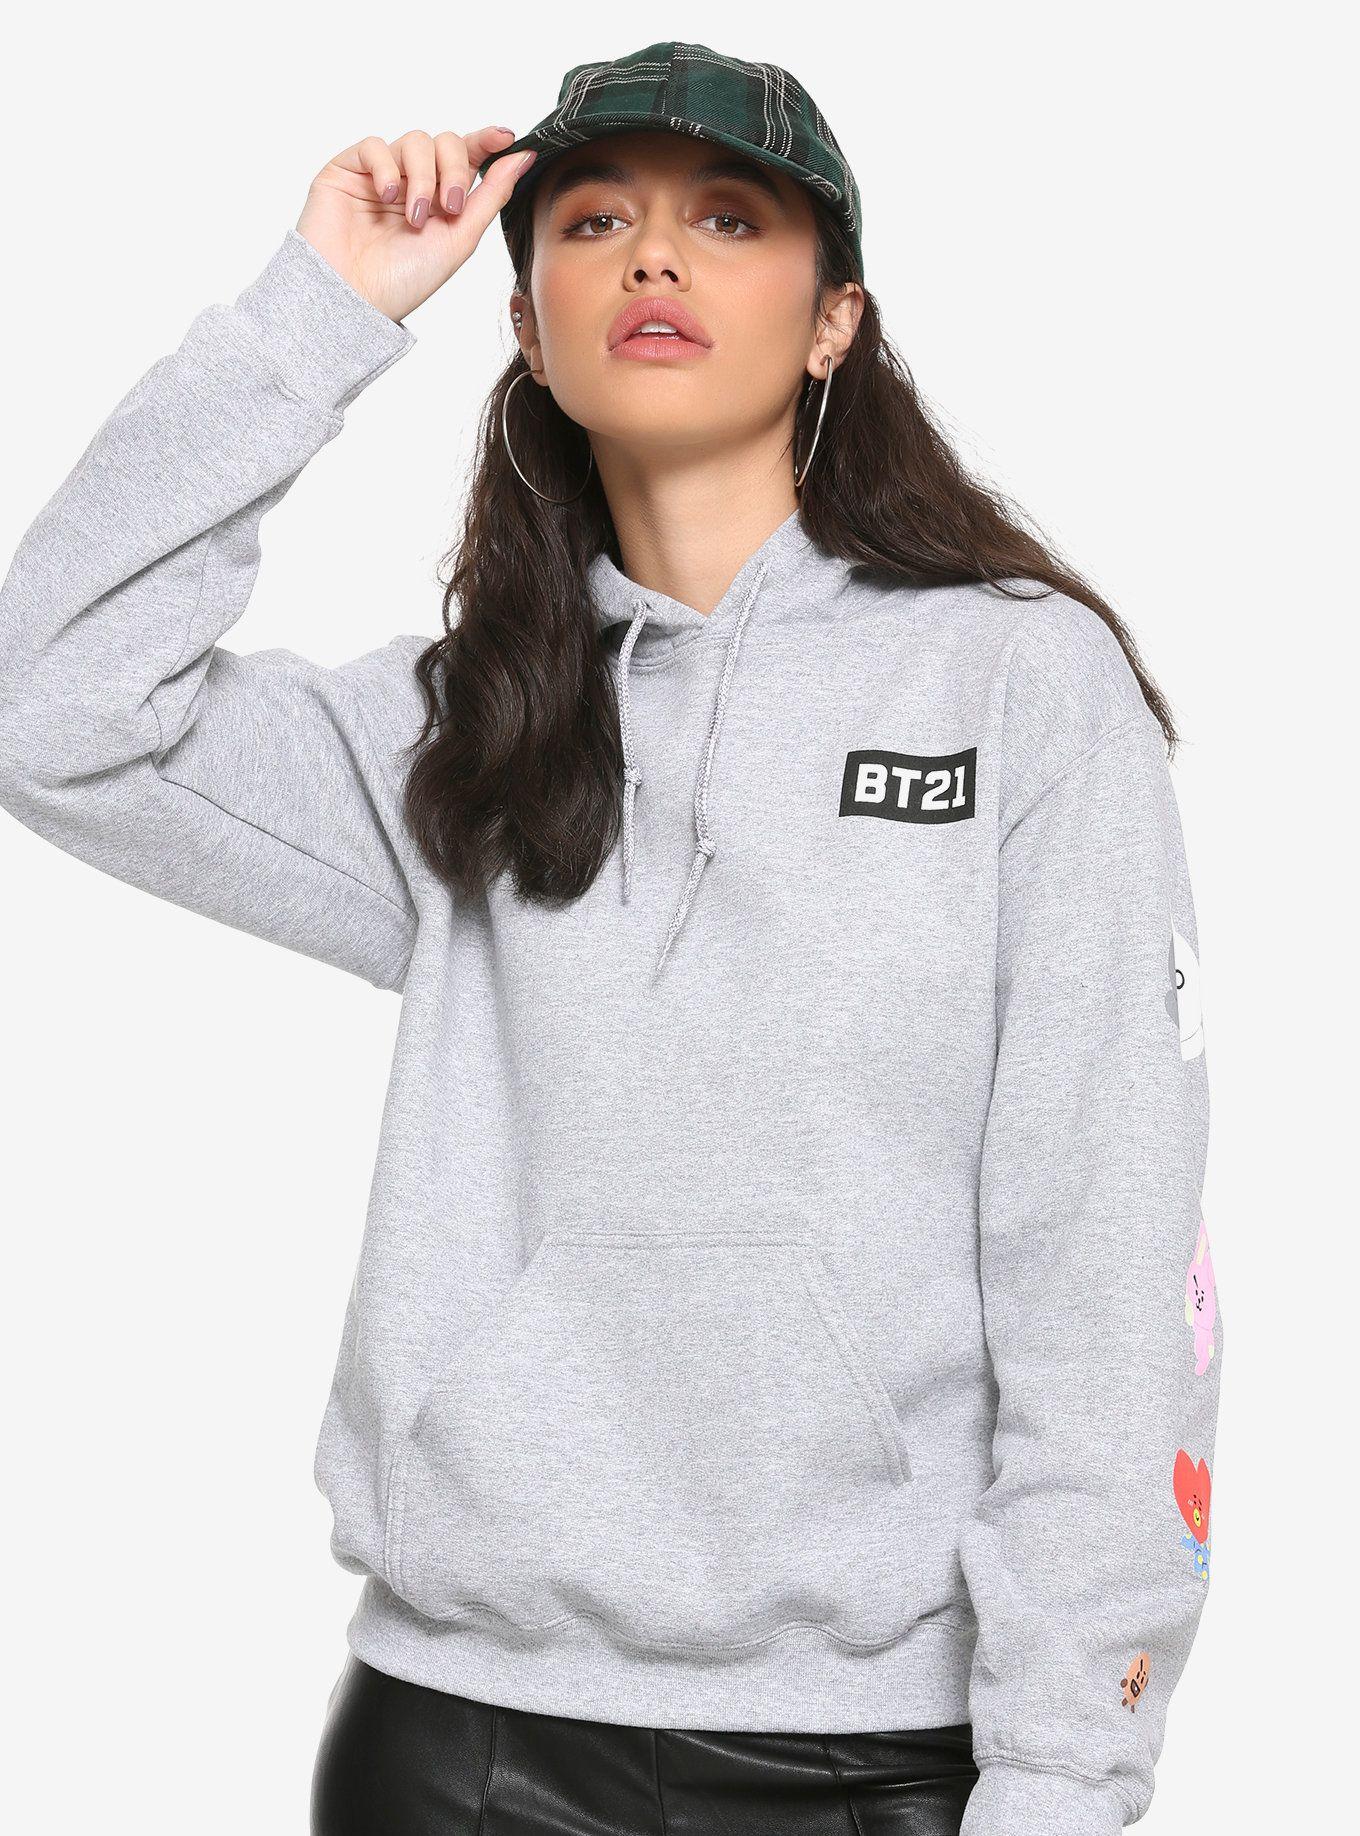 Bt21 logo girls hoodie